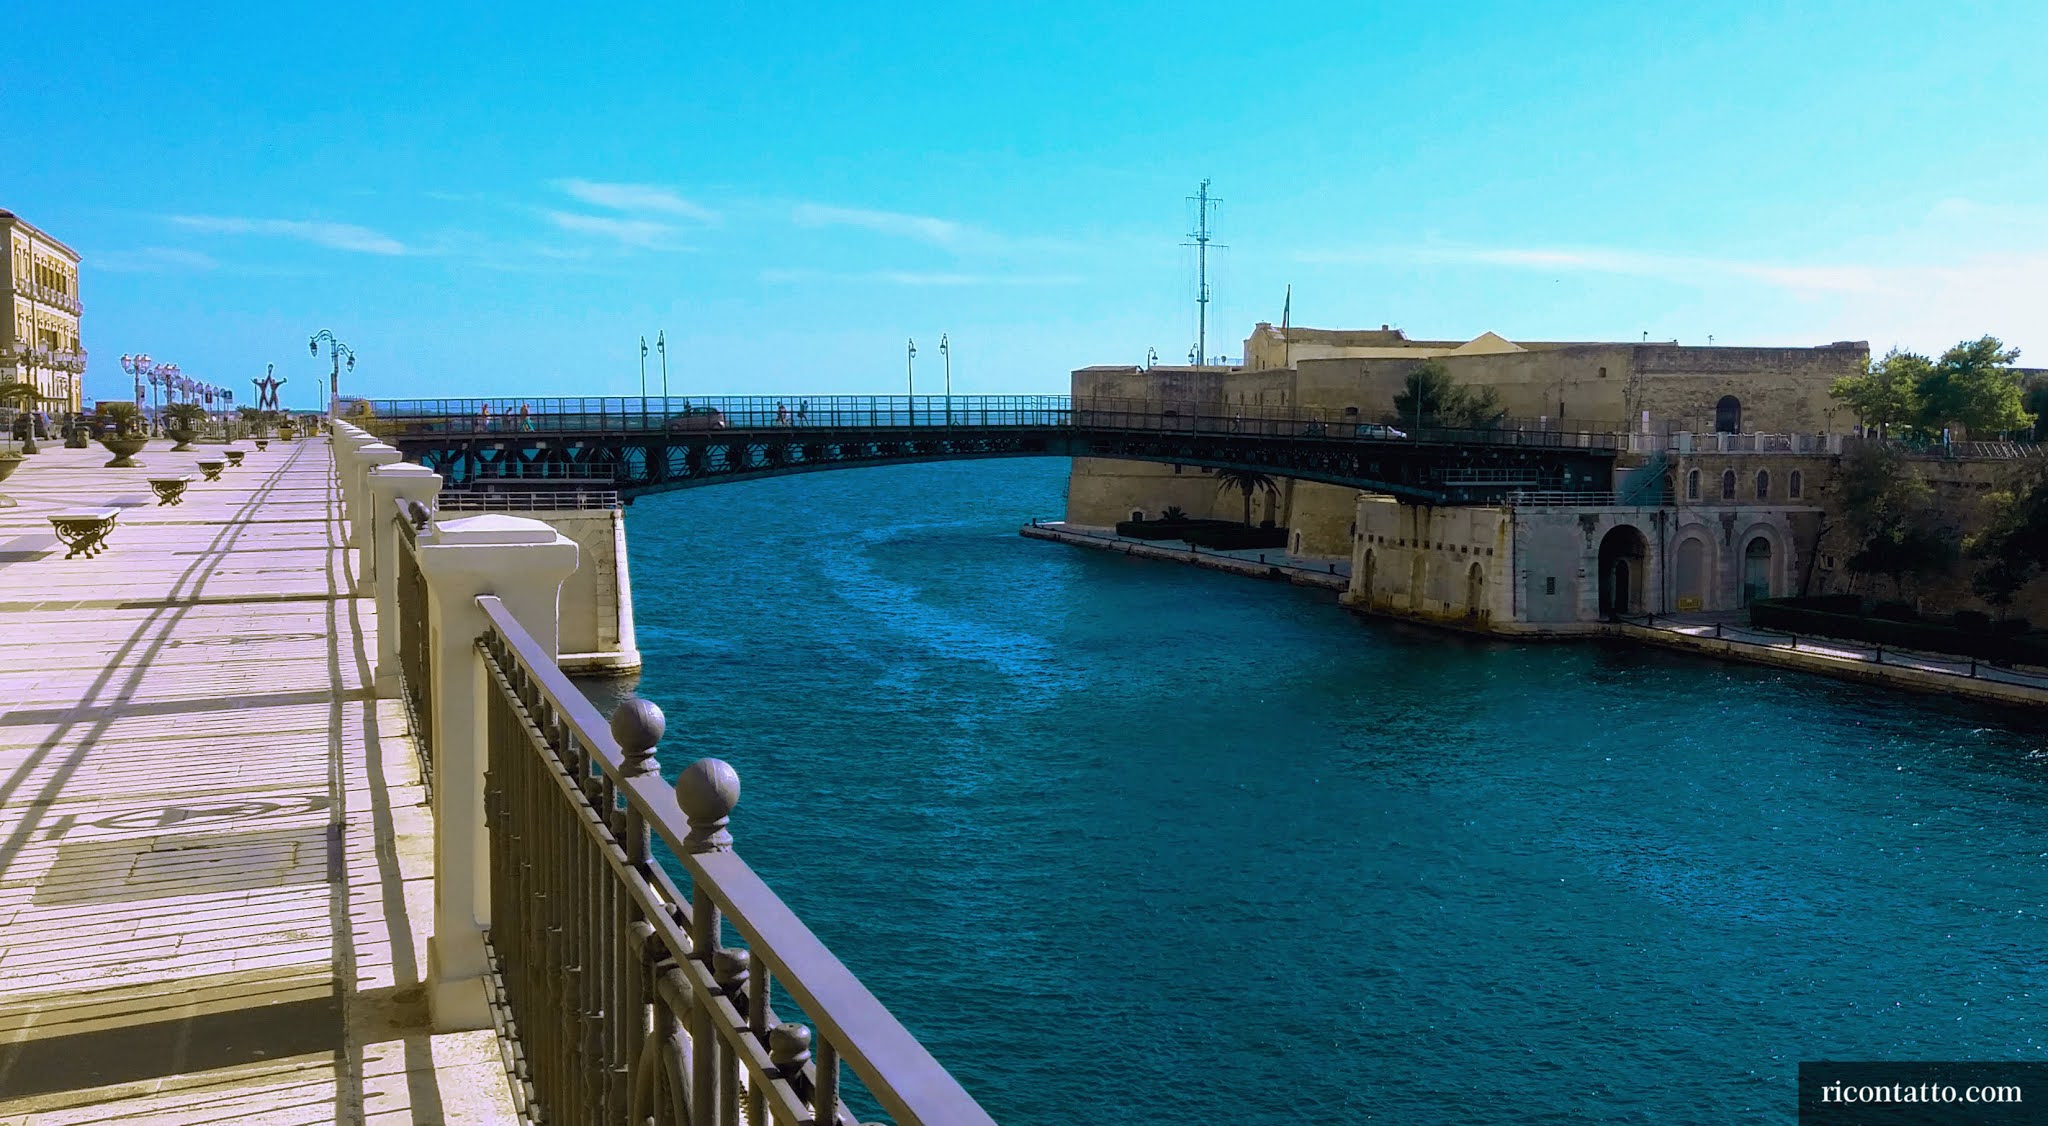 Taranto, Puglia, Italy - Photo #08 by Ricontatto.com